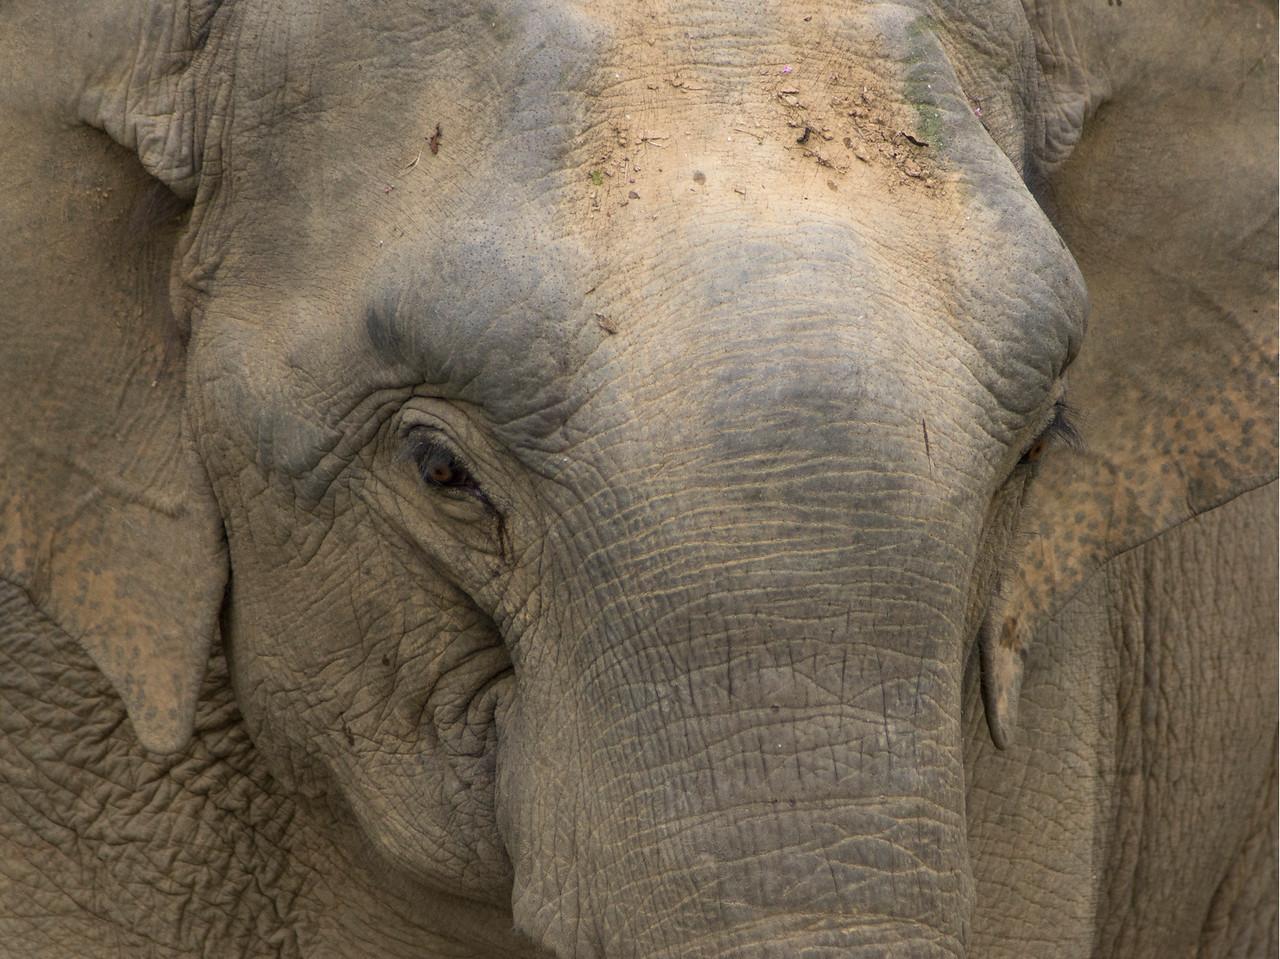 elephant, Khao Sok National Park, Cheow Lan Lake, Thailand